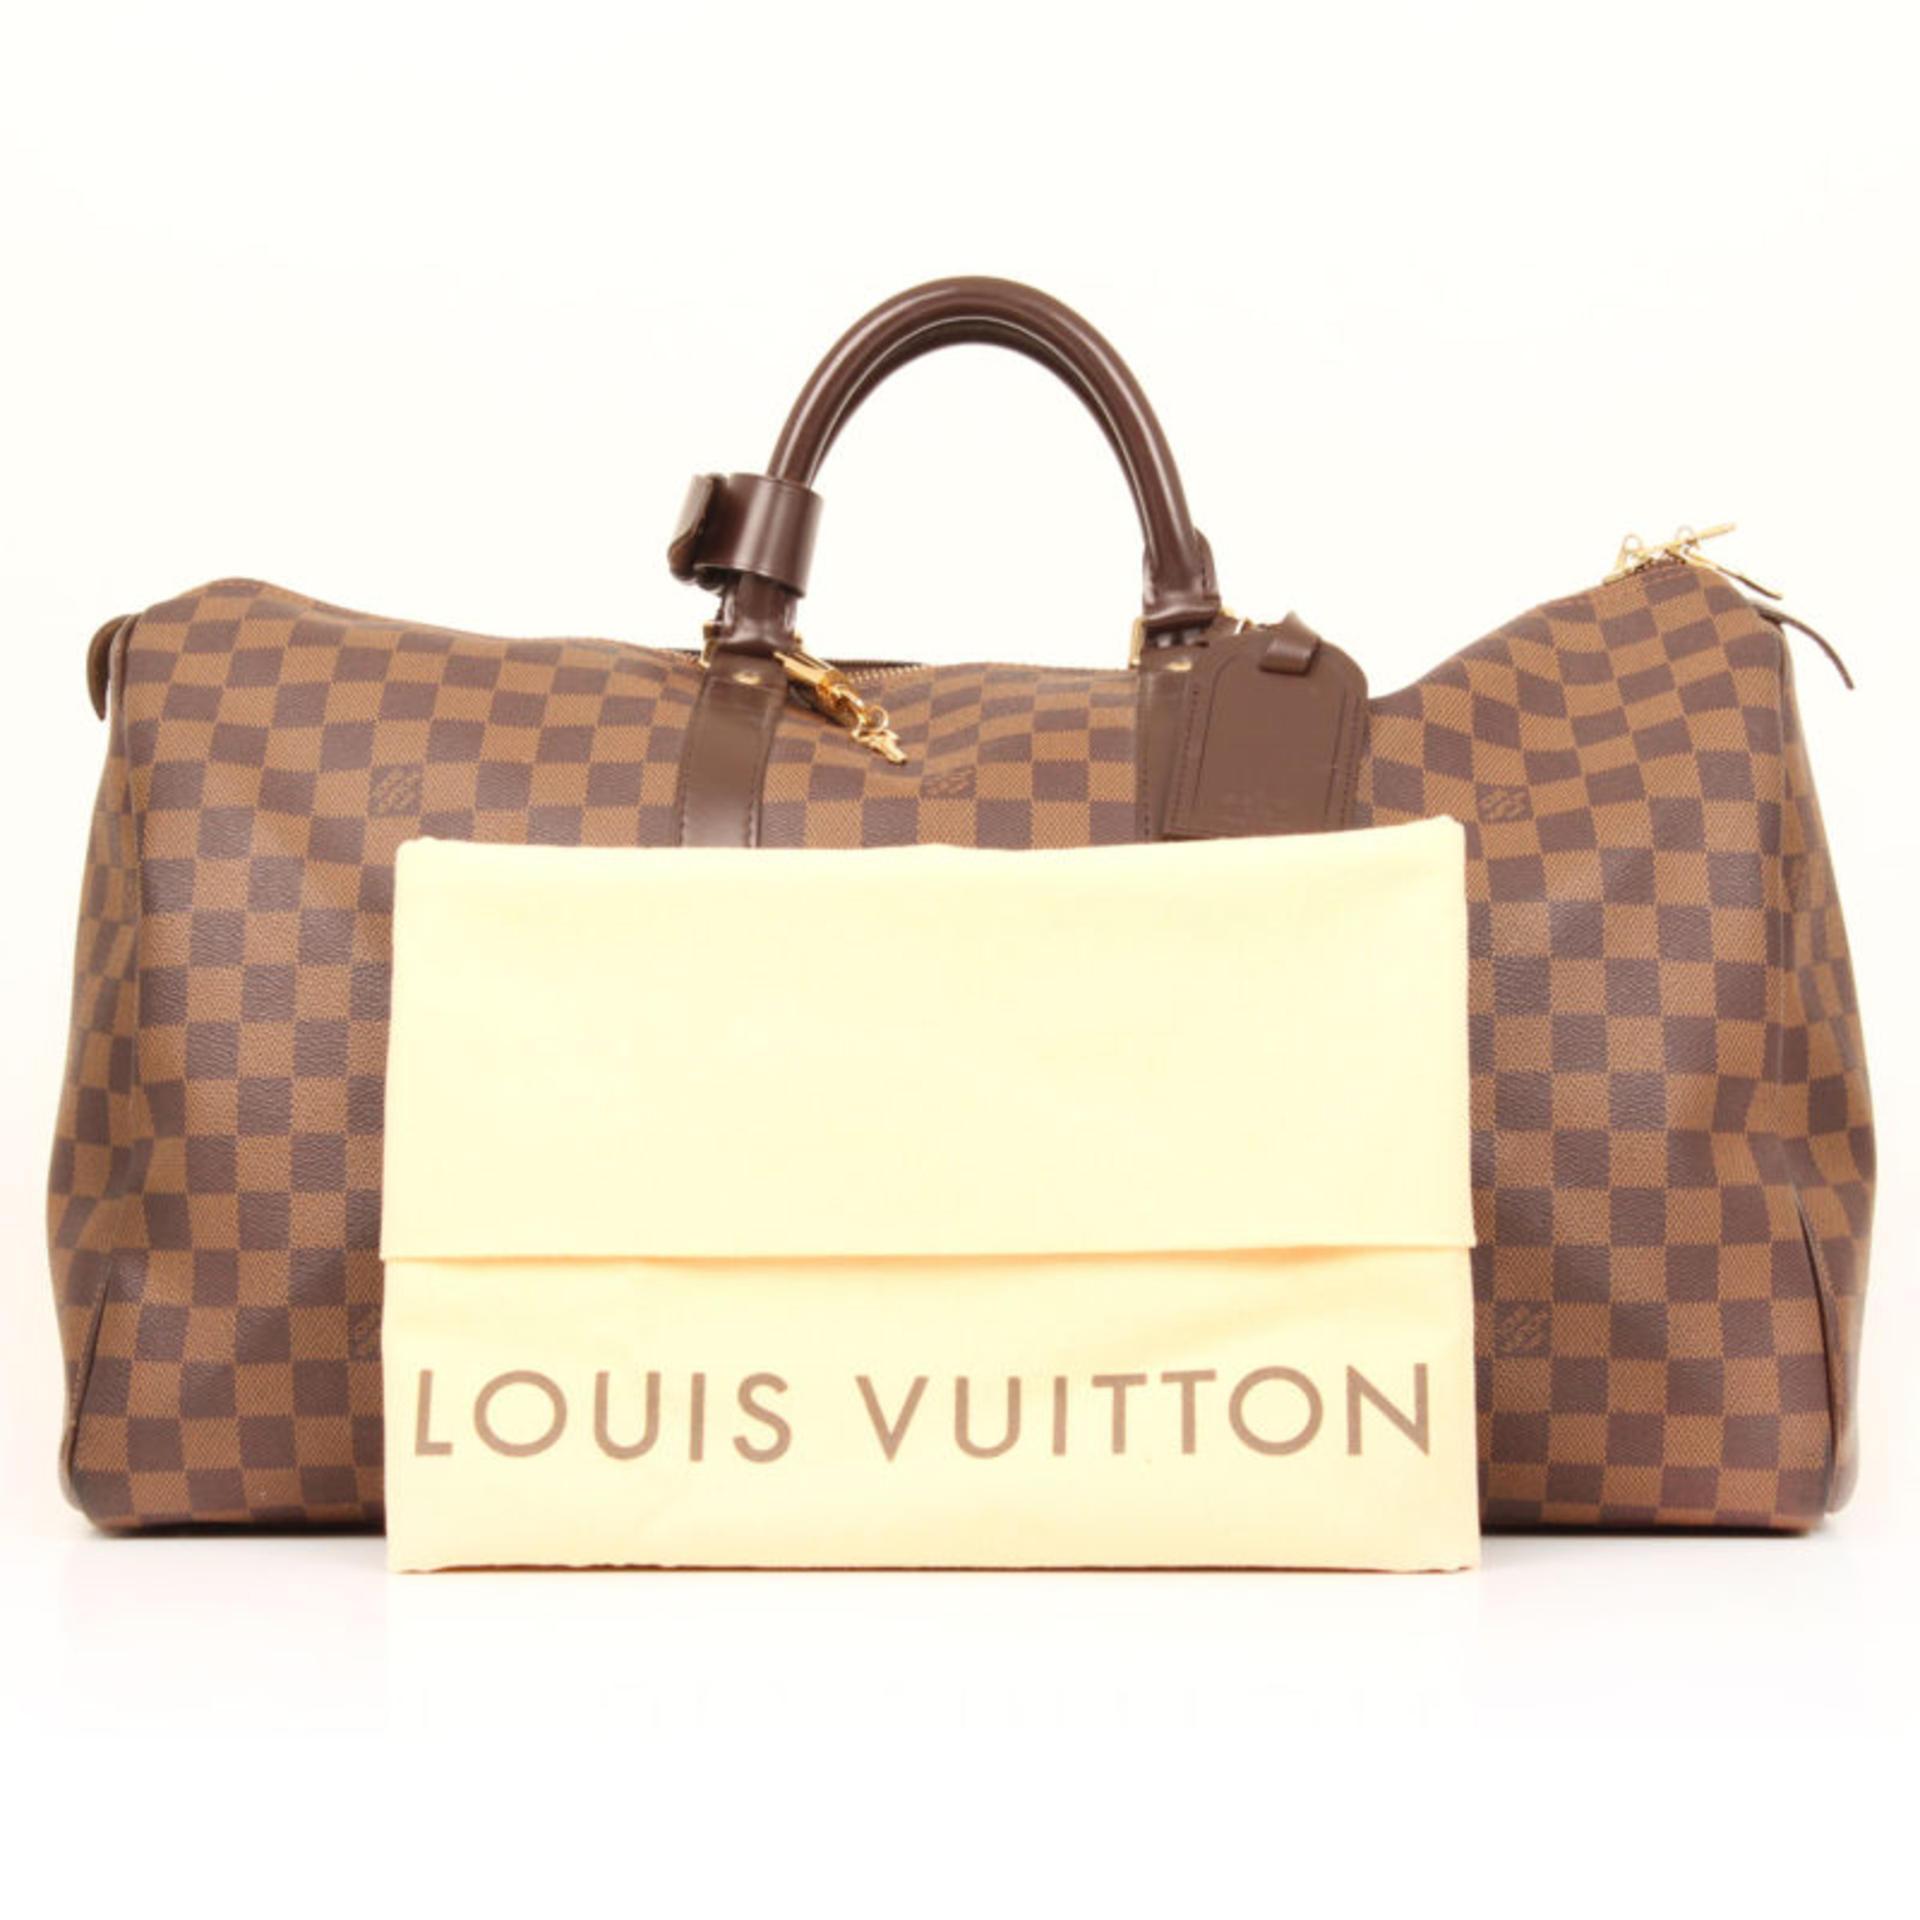 09da3725f Comprar Louis Vuitton Online Mexico | Stanford Center for ...